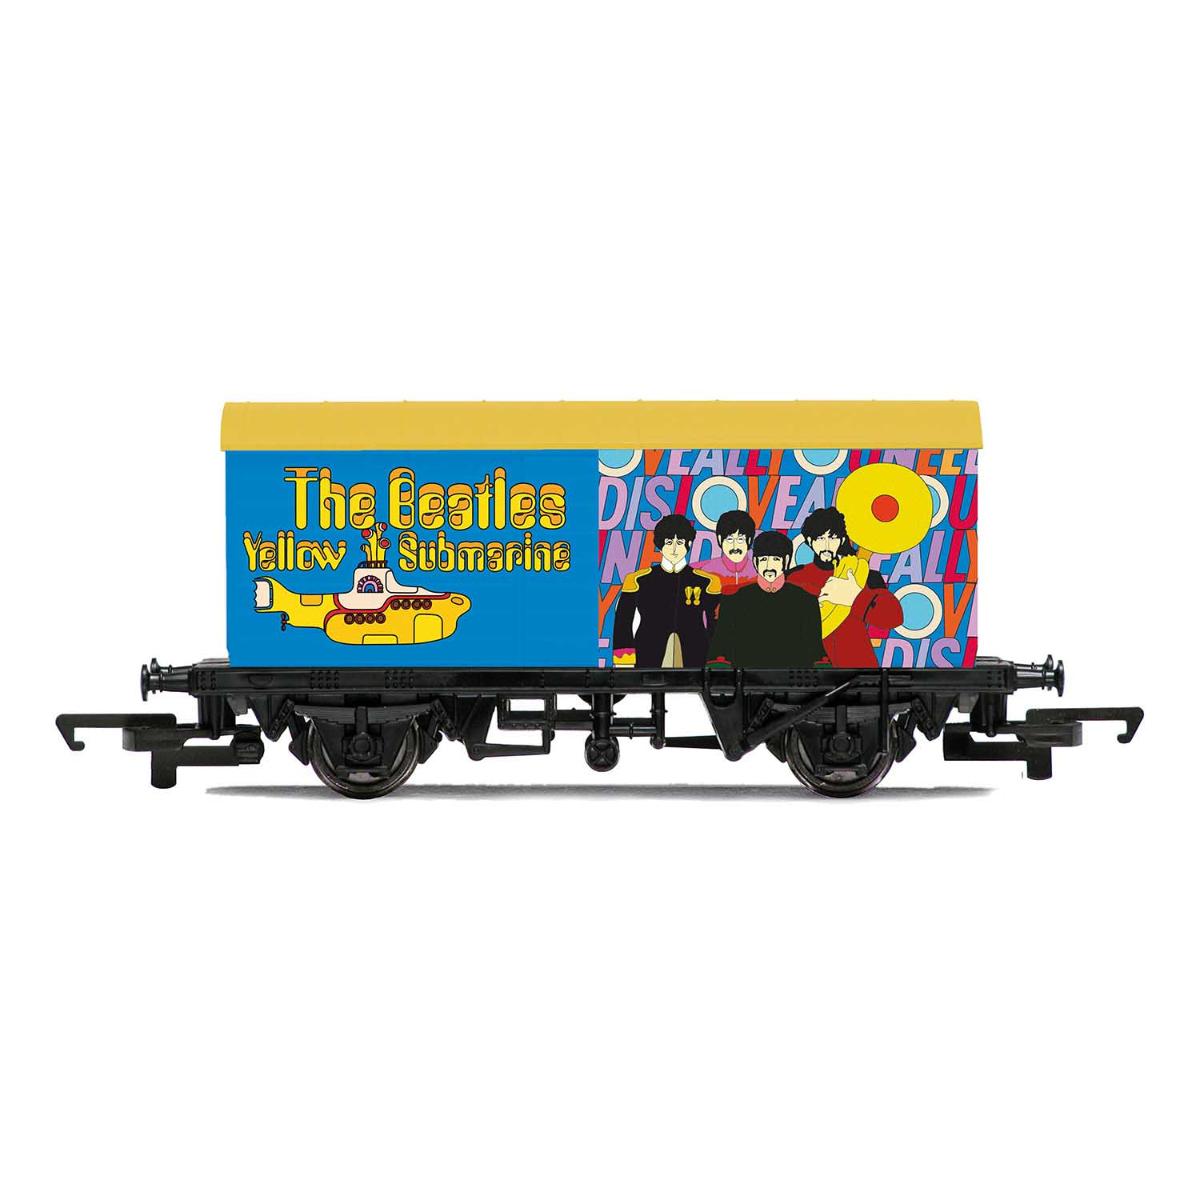 The Beatles Yellow Submarine Wagon